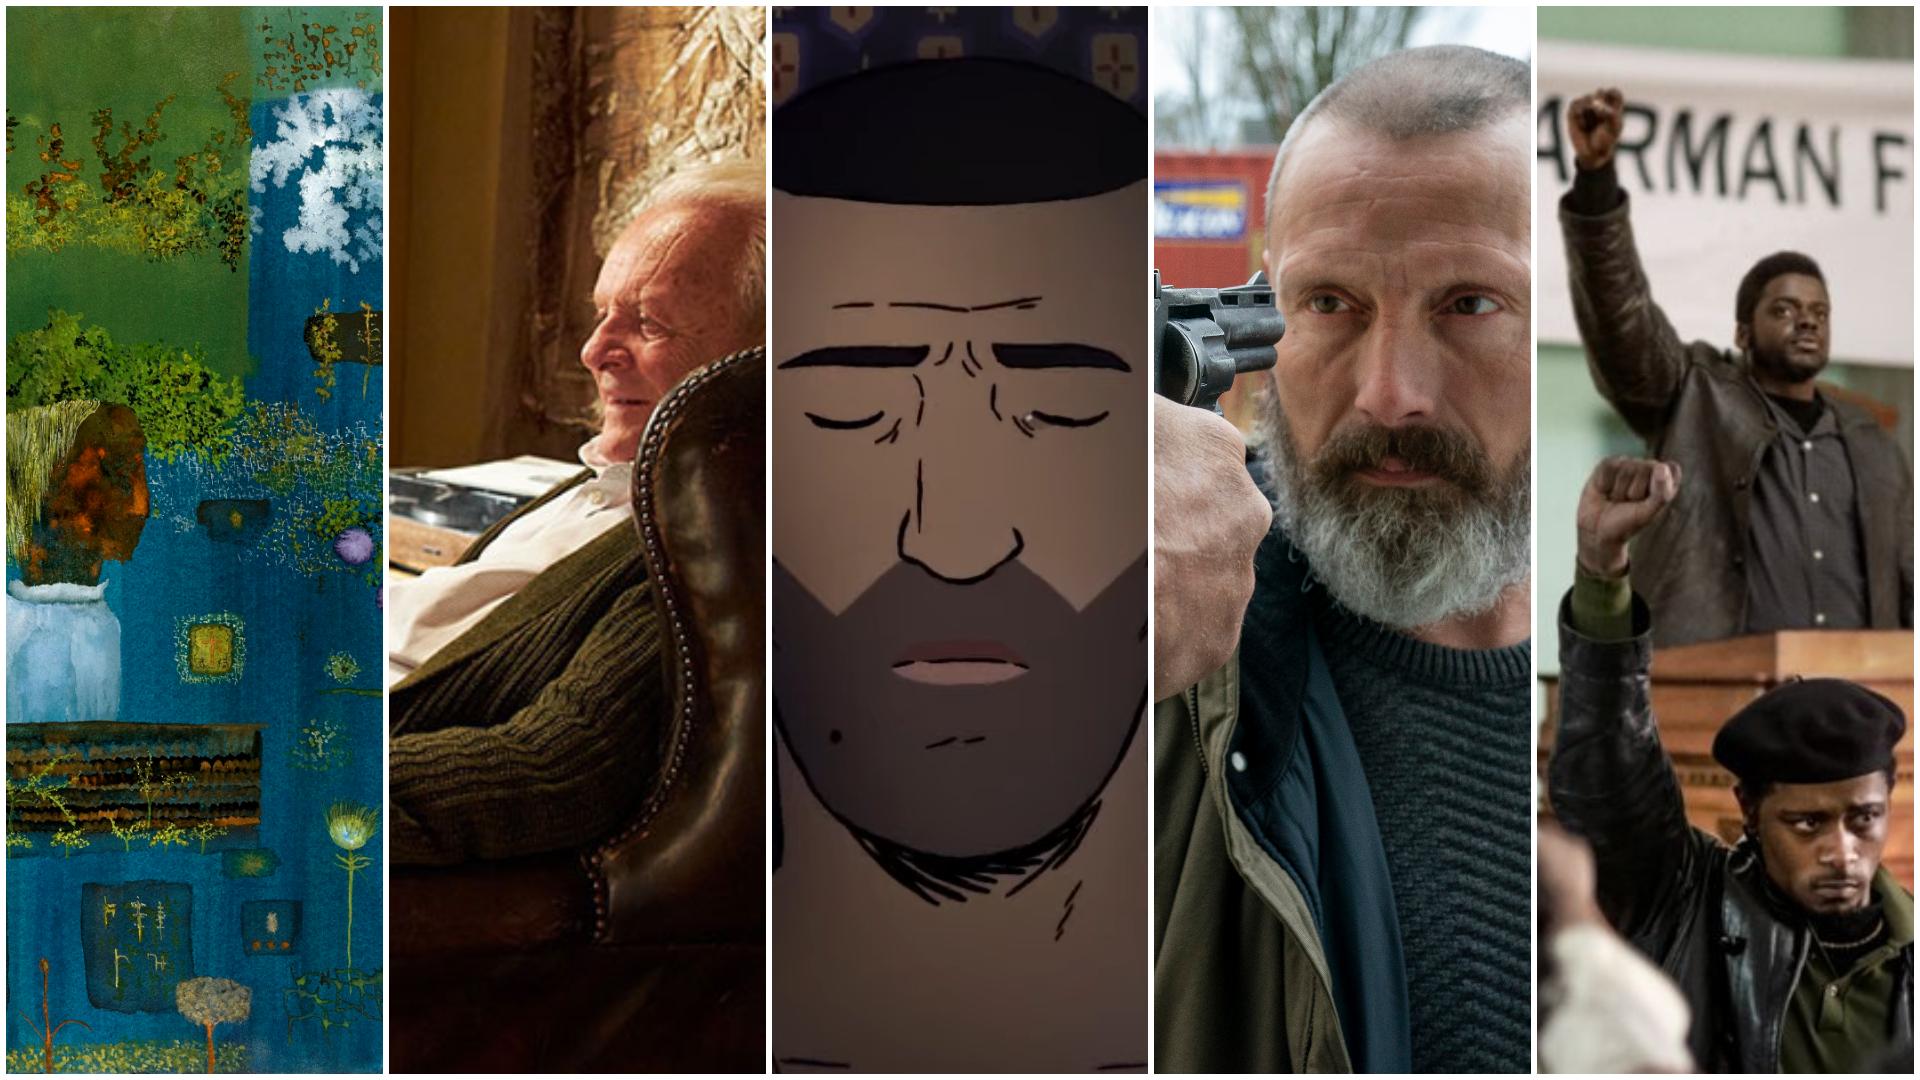 The Best Films of 2021 So Far: A Year of Hidden Gems